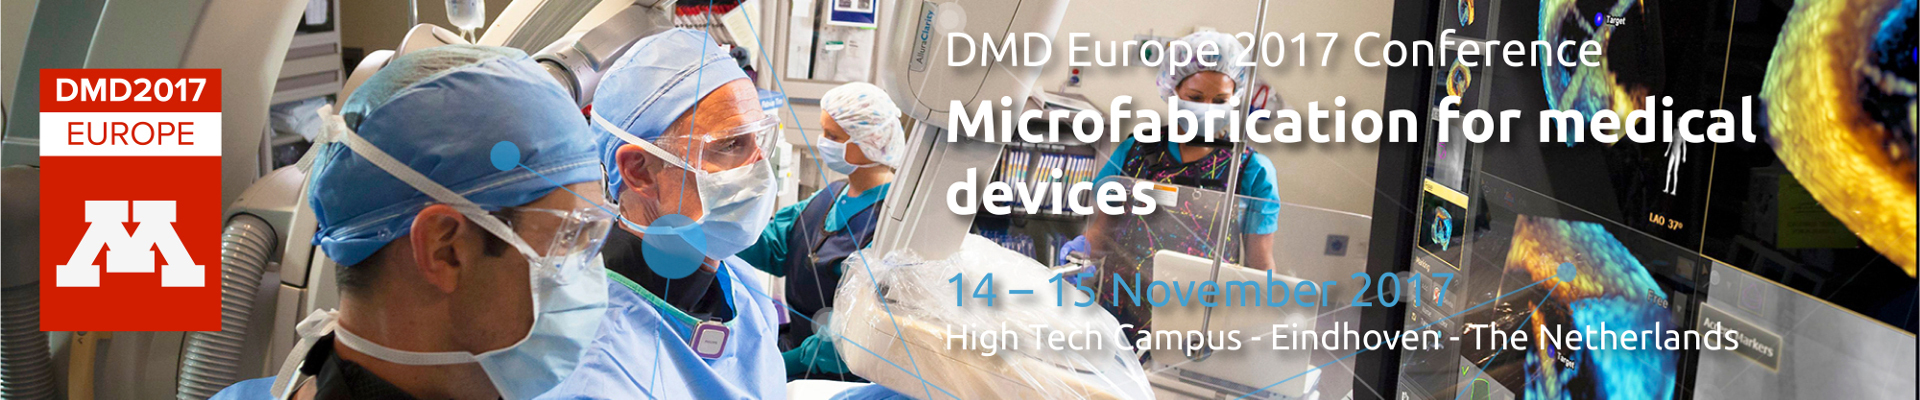 DMD EUROPE 2017